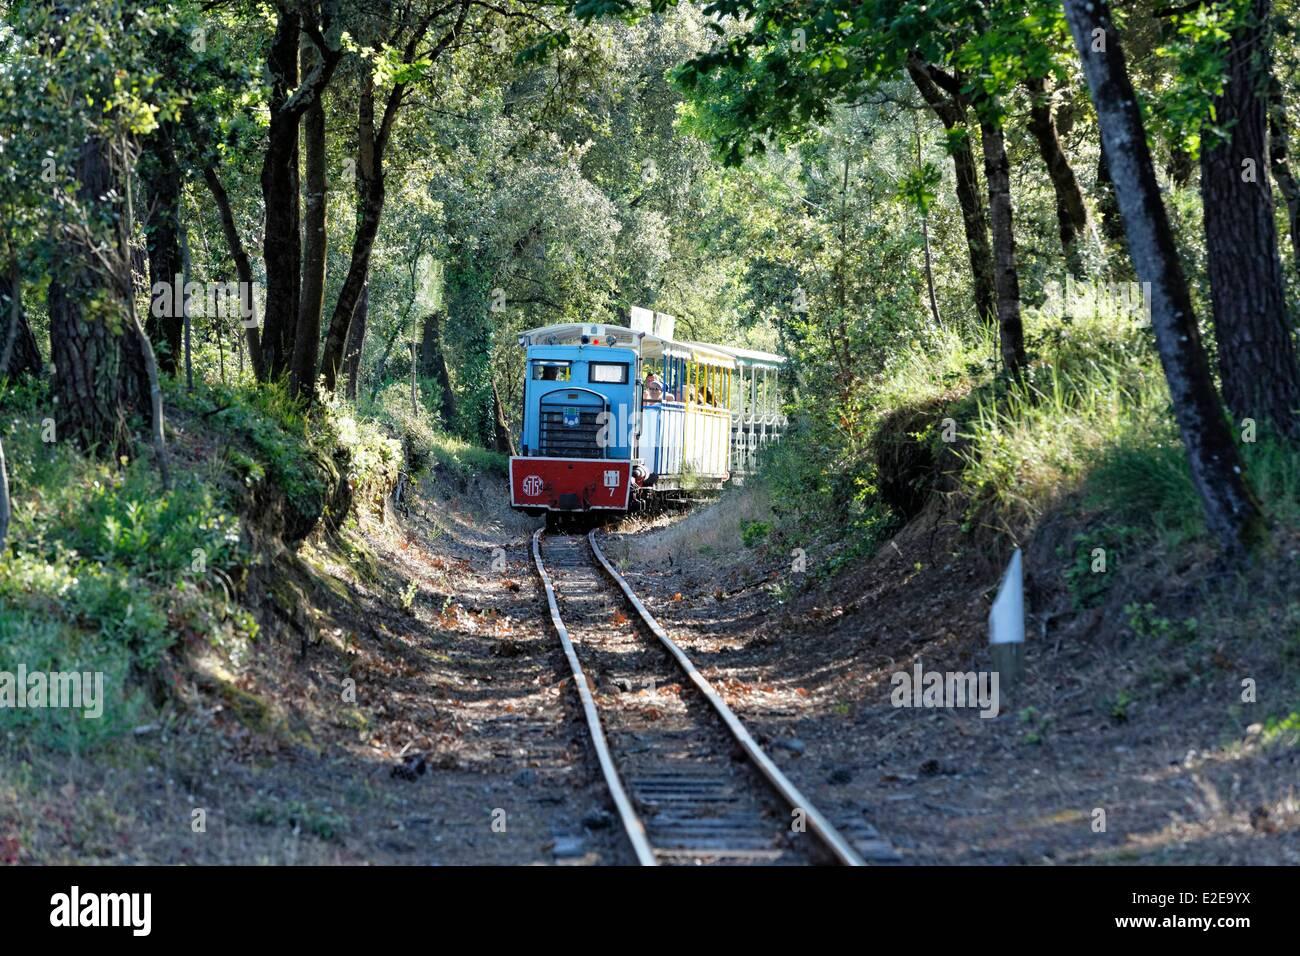 France, Charente Maritime, Ile d'Oleron, small train of Saint-Trojan-Les-Bains - Stock Image